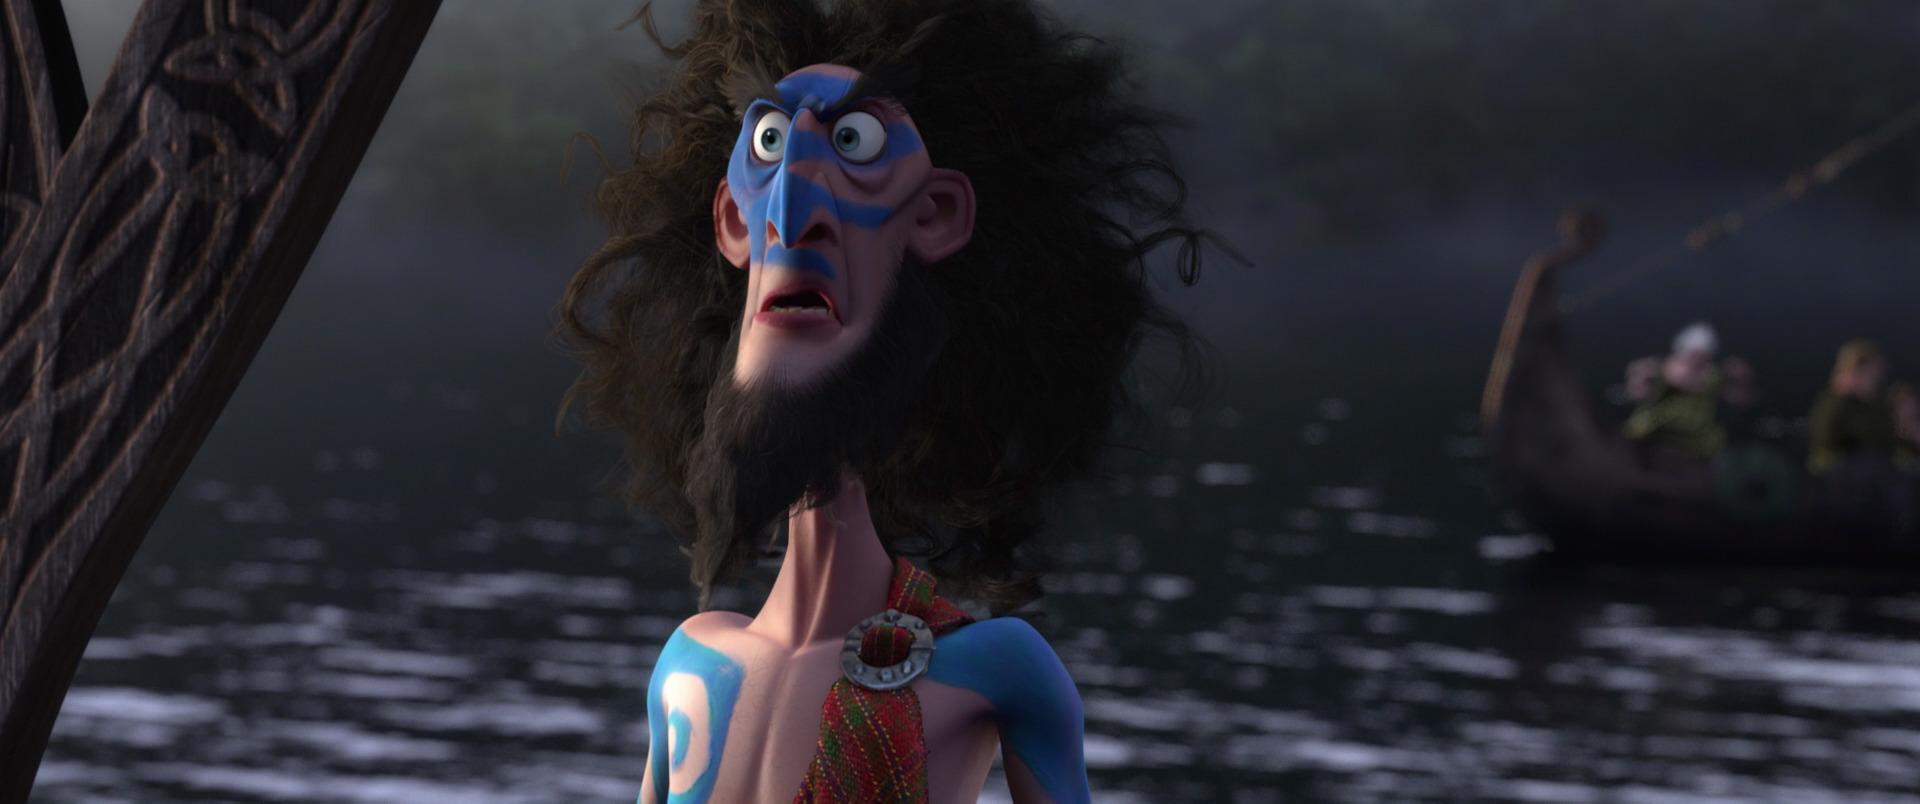 lord macintosh pixar disney character rebelle brave